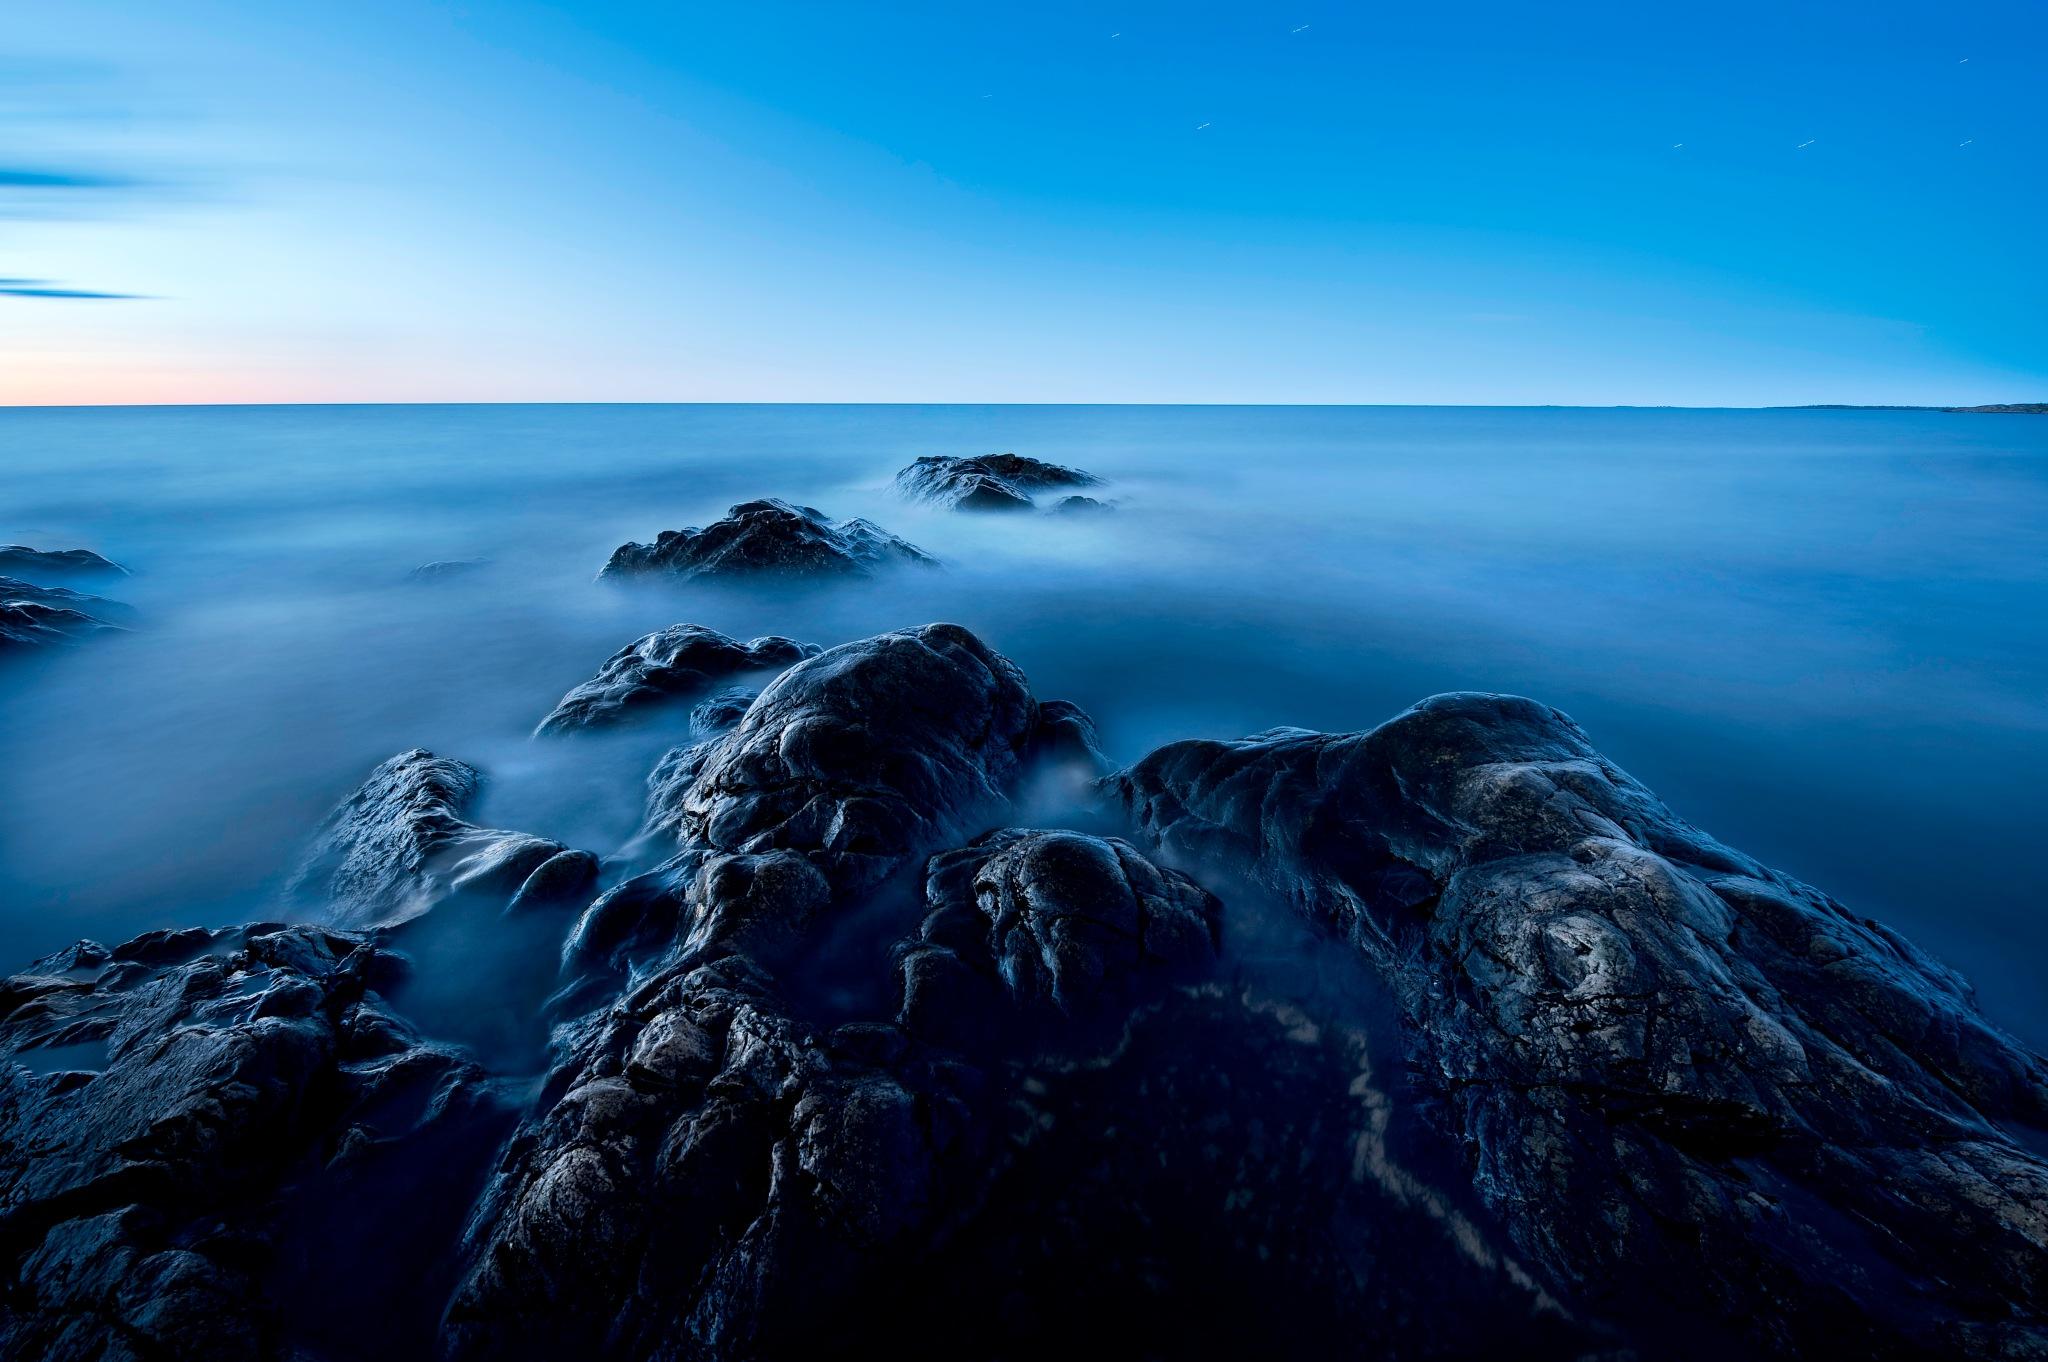 Blue ocean by Magnus Eriksson